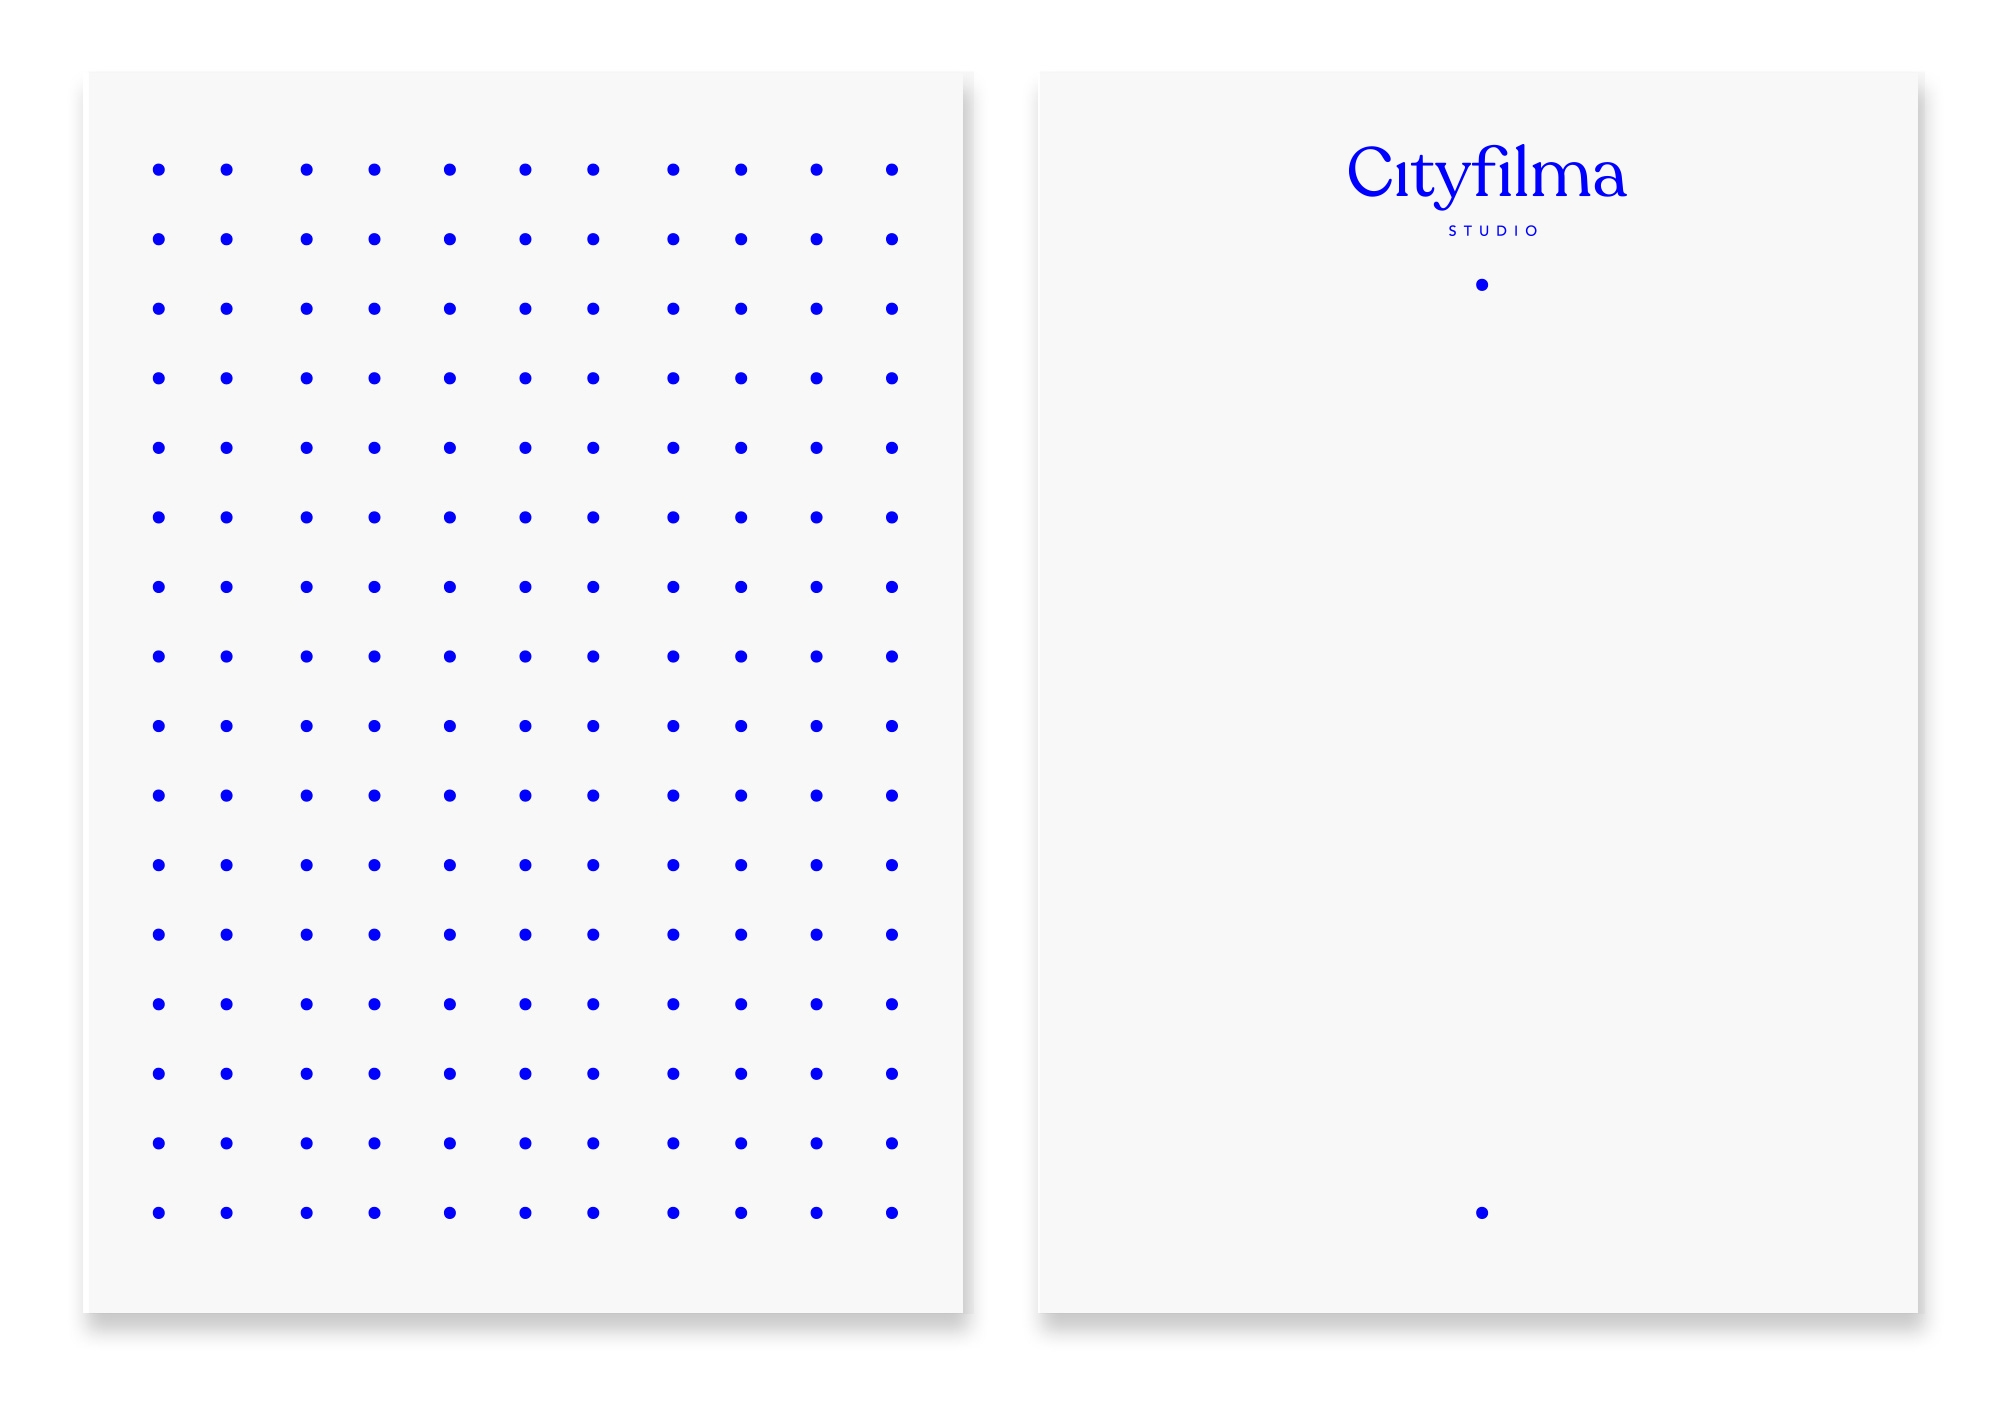 diseño branding papeleria estudio foto